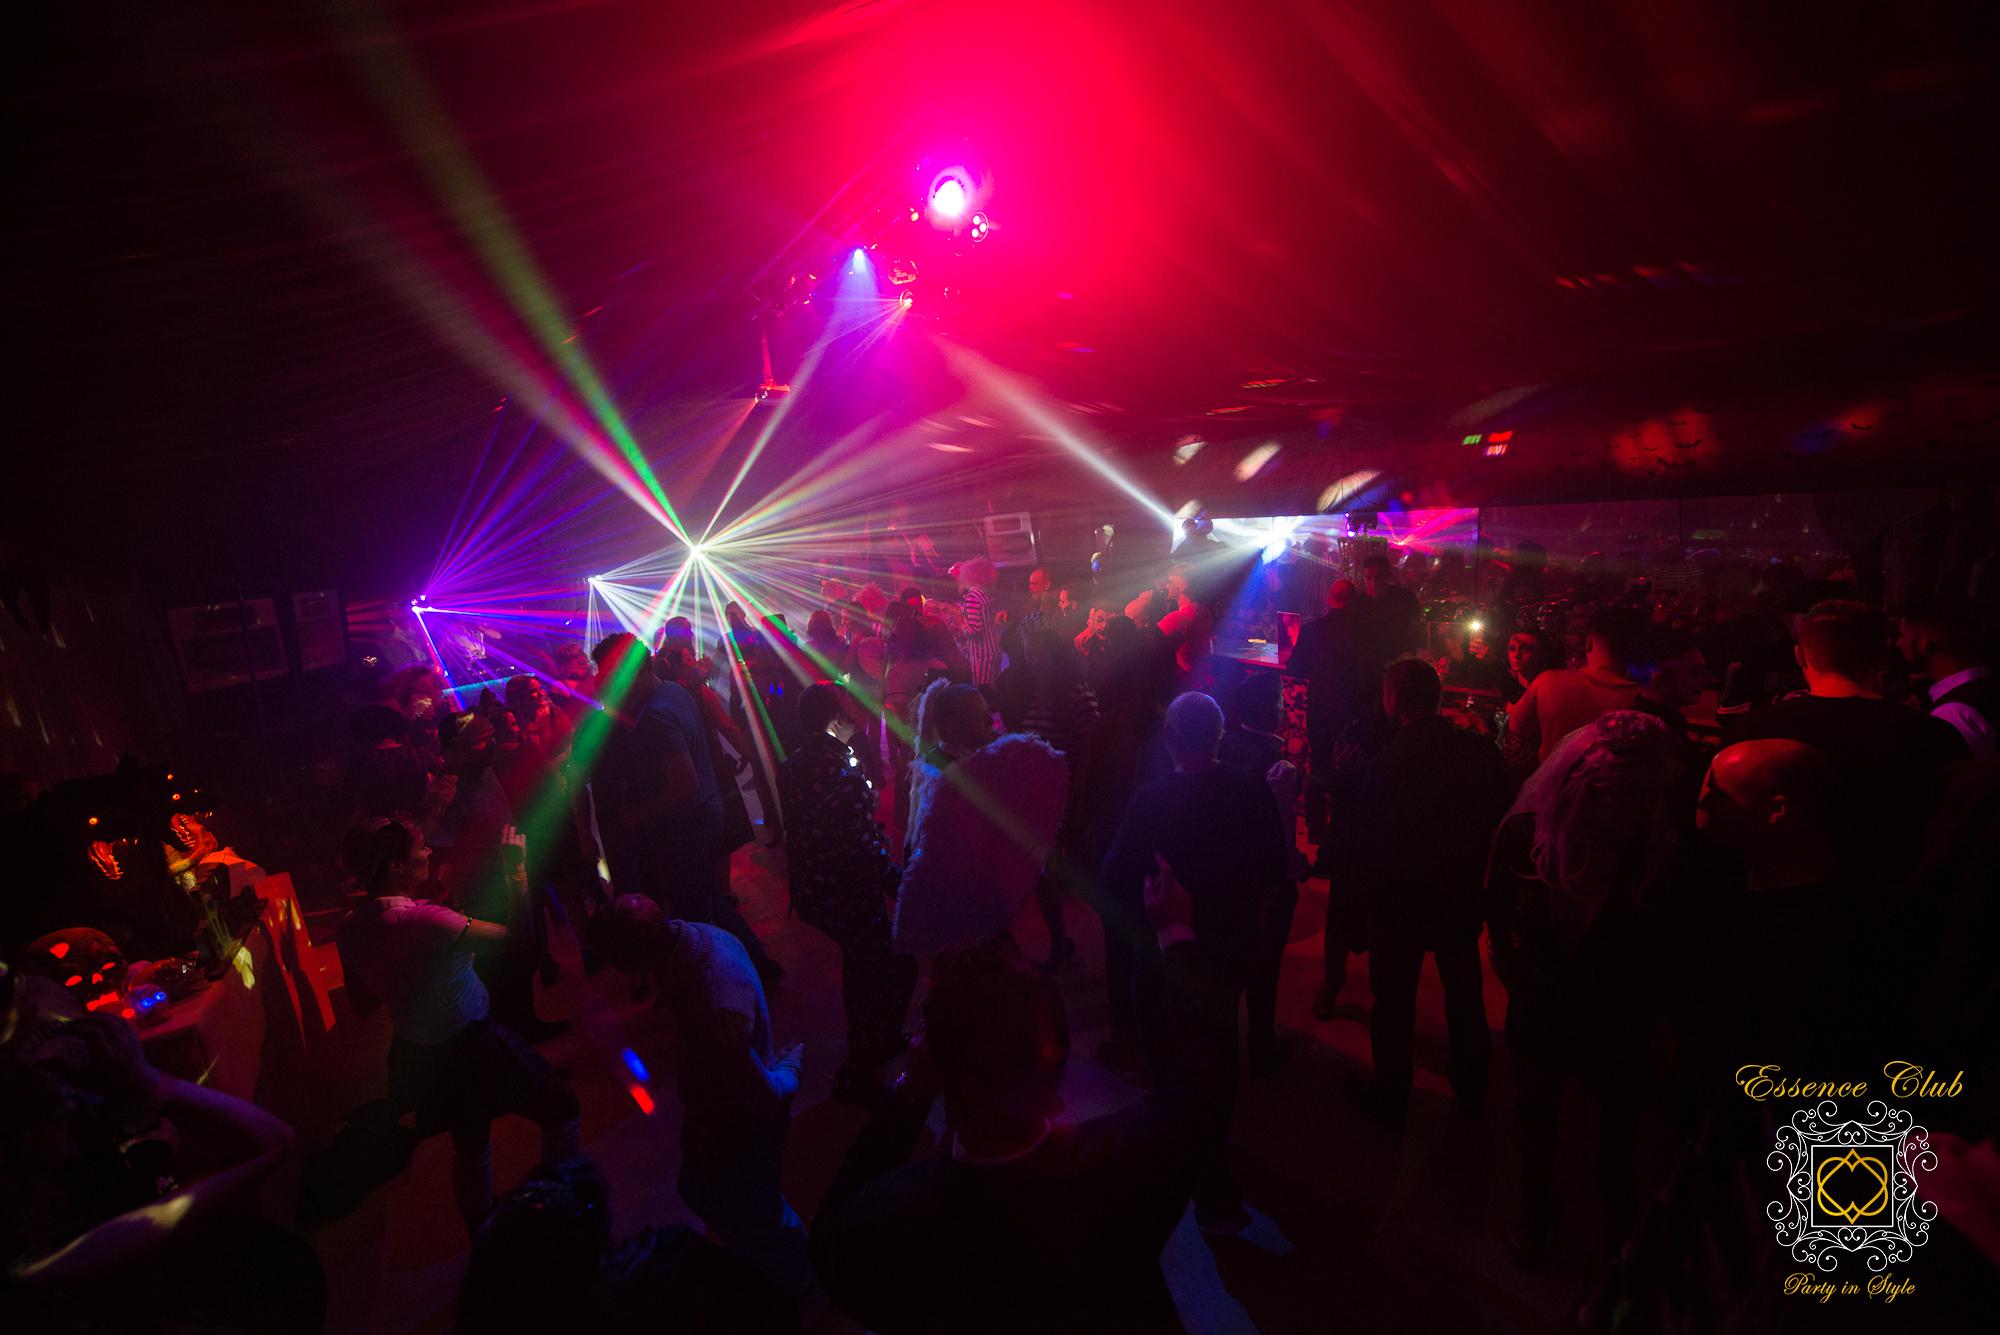 Essence club hell room